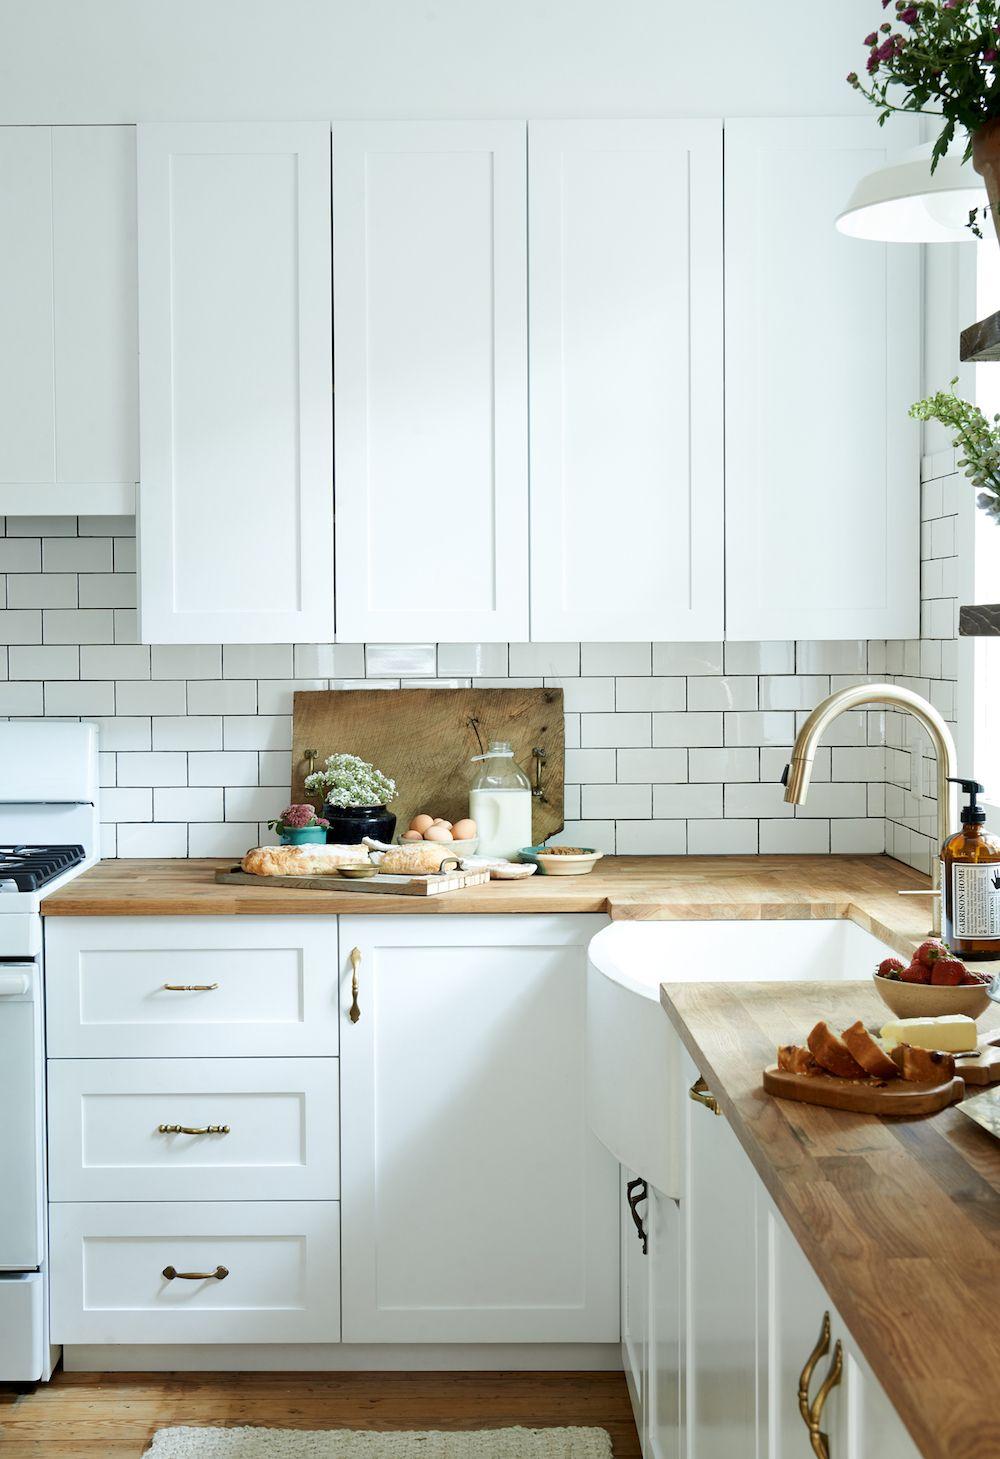 Farmhouse Quartet Concrete Apron Front Kitchen Sink Haus Kuchen Ikea Kuche Landhaus Ikea Kuche